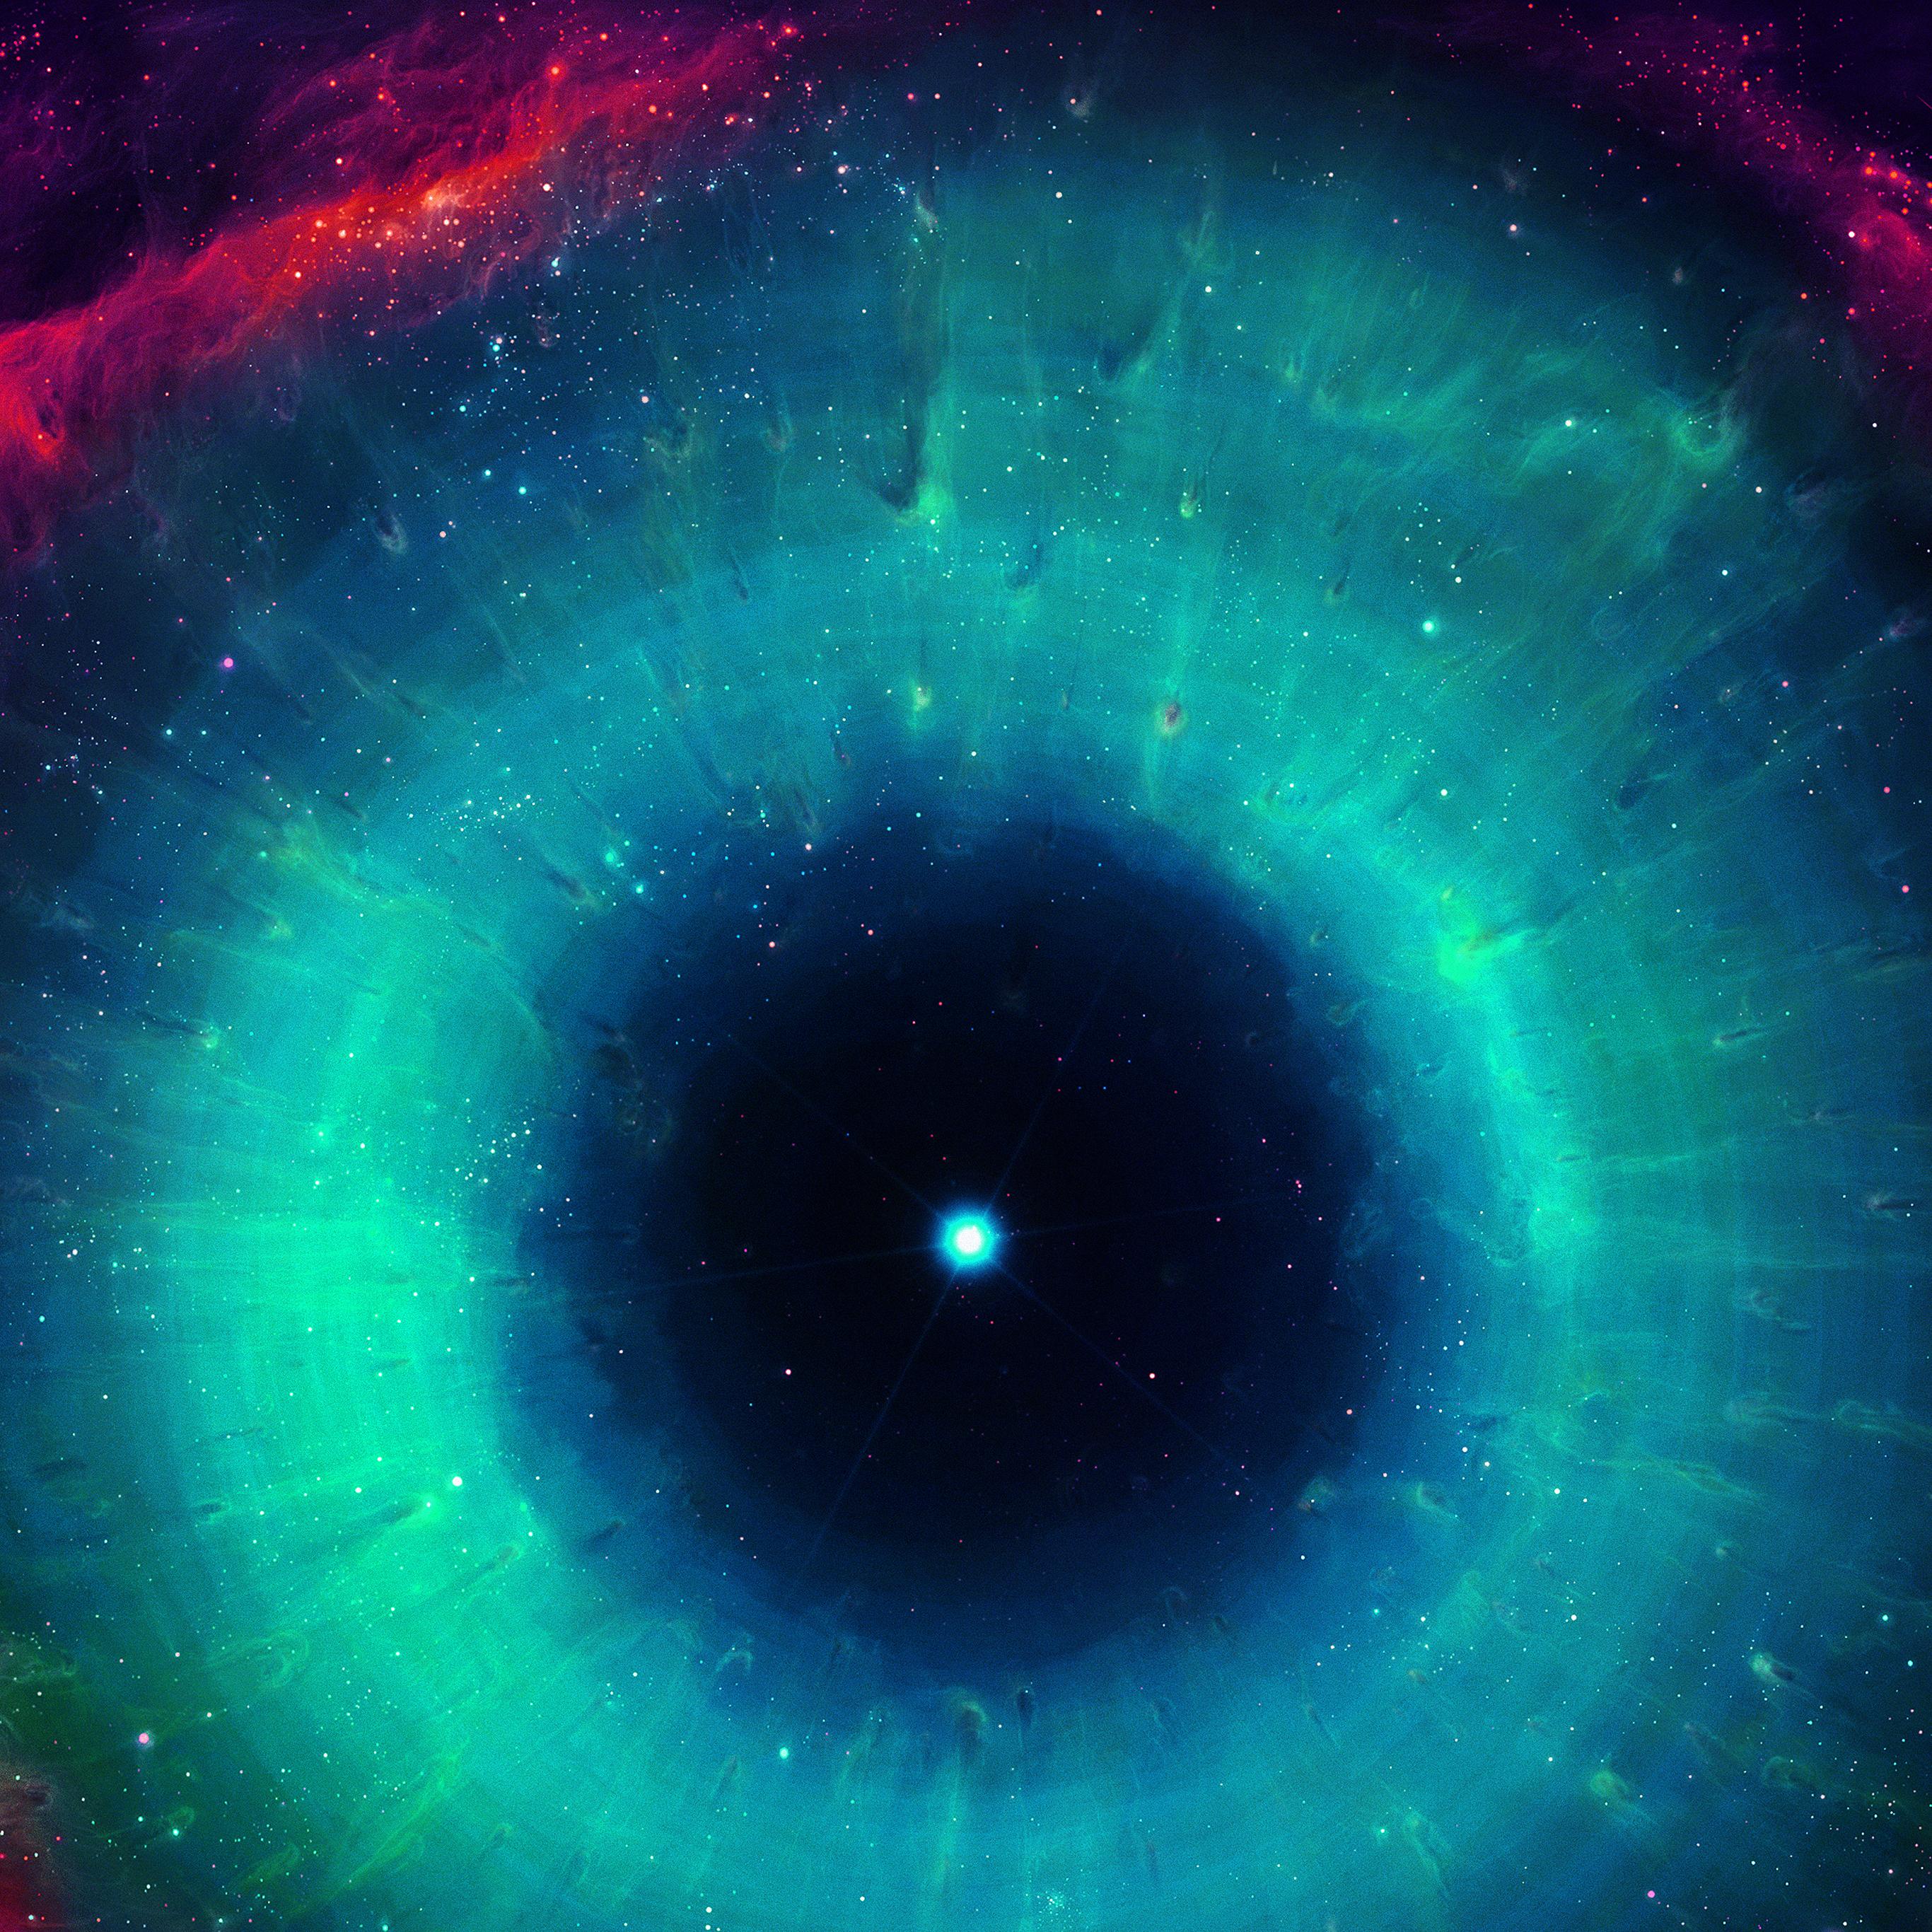 Galaxy Wallpapers: Md12-wallpaper-galaxy-eye-center-gren-space-stars